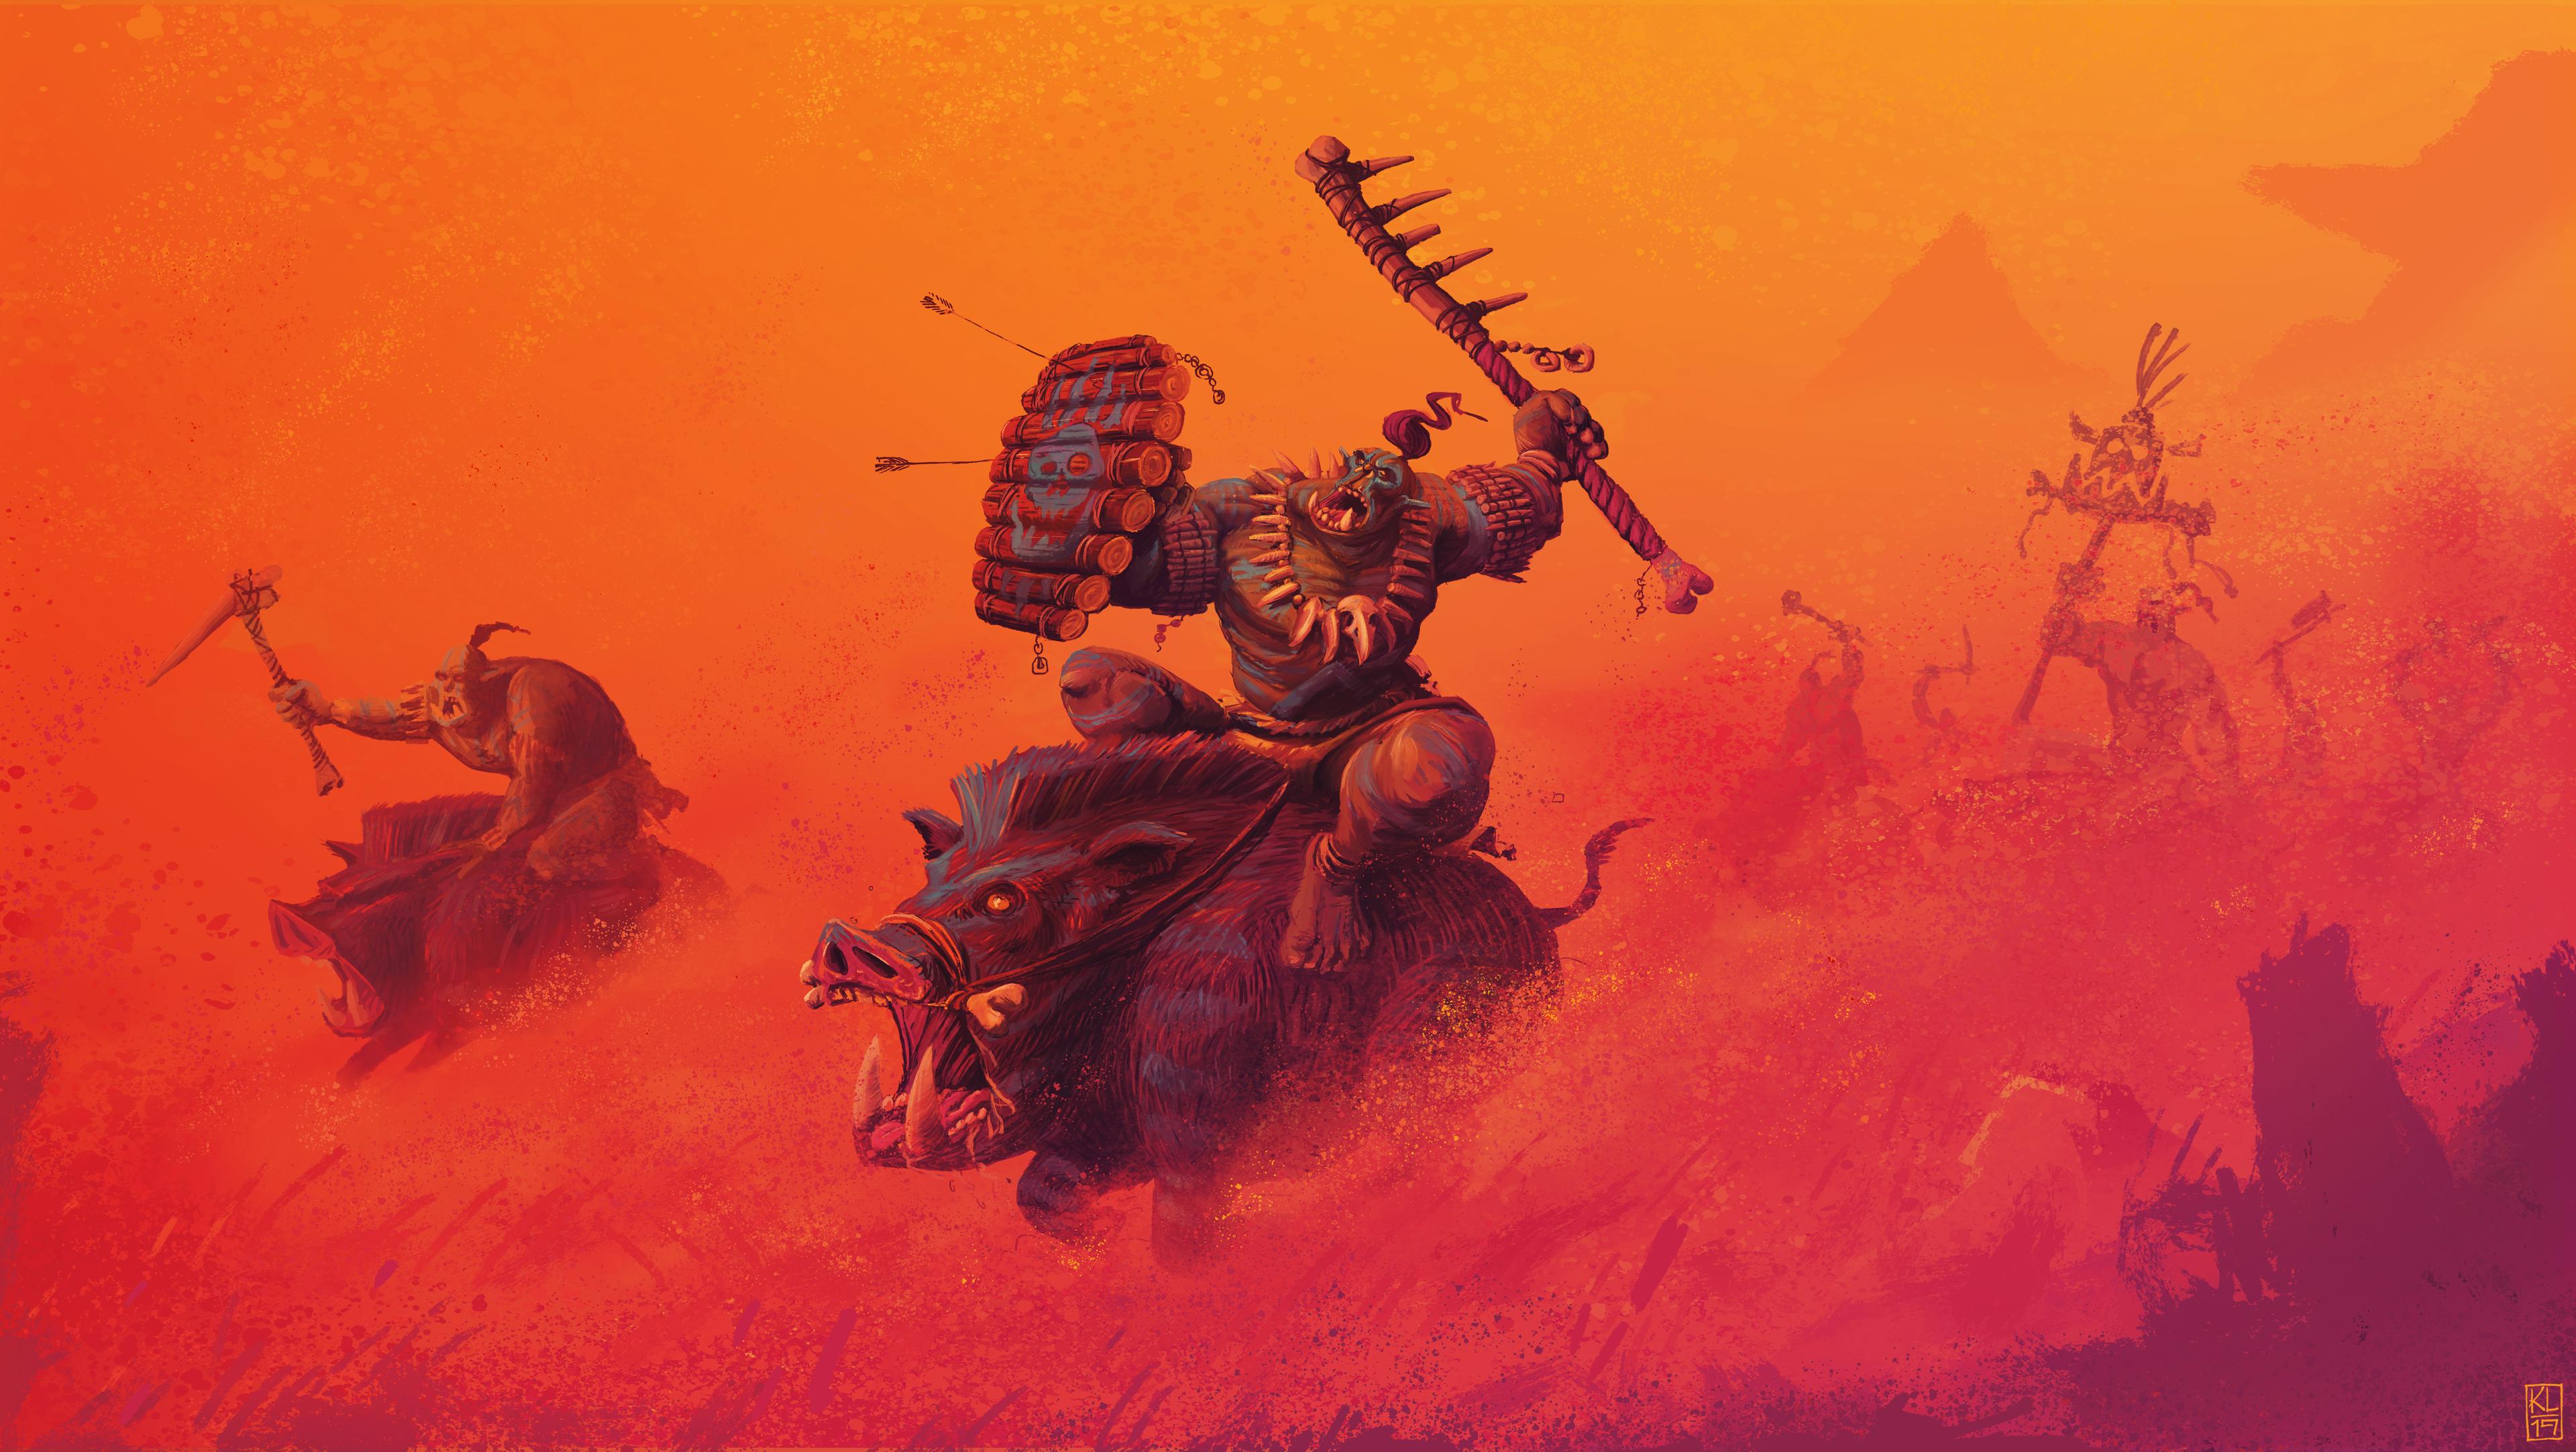 total war warhammer ii 1581276103 - Total War Warhammer II - Total War Warhammer II game wallpapers, Total War Warhammer II 4k wallpapers